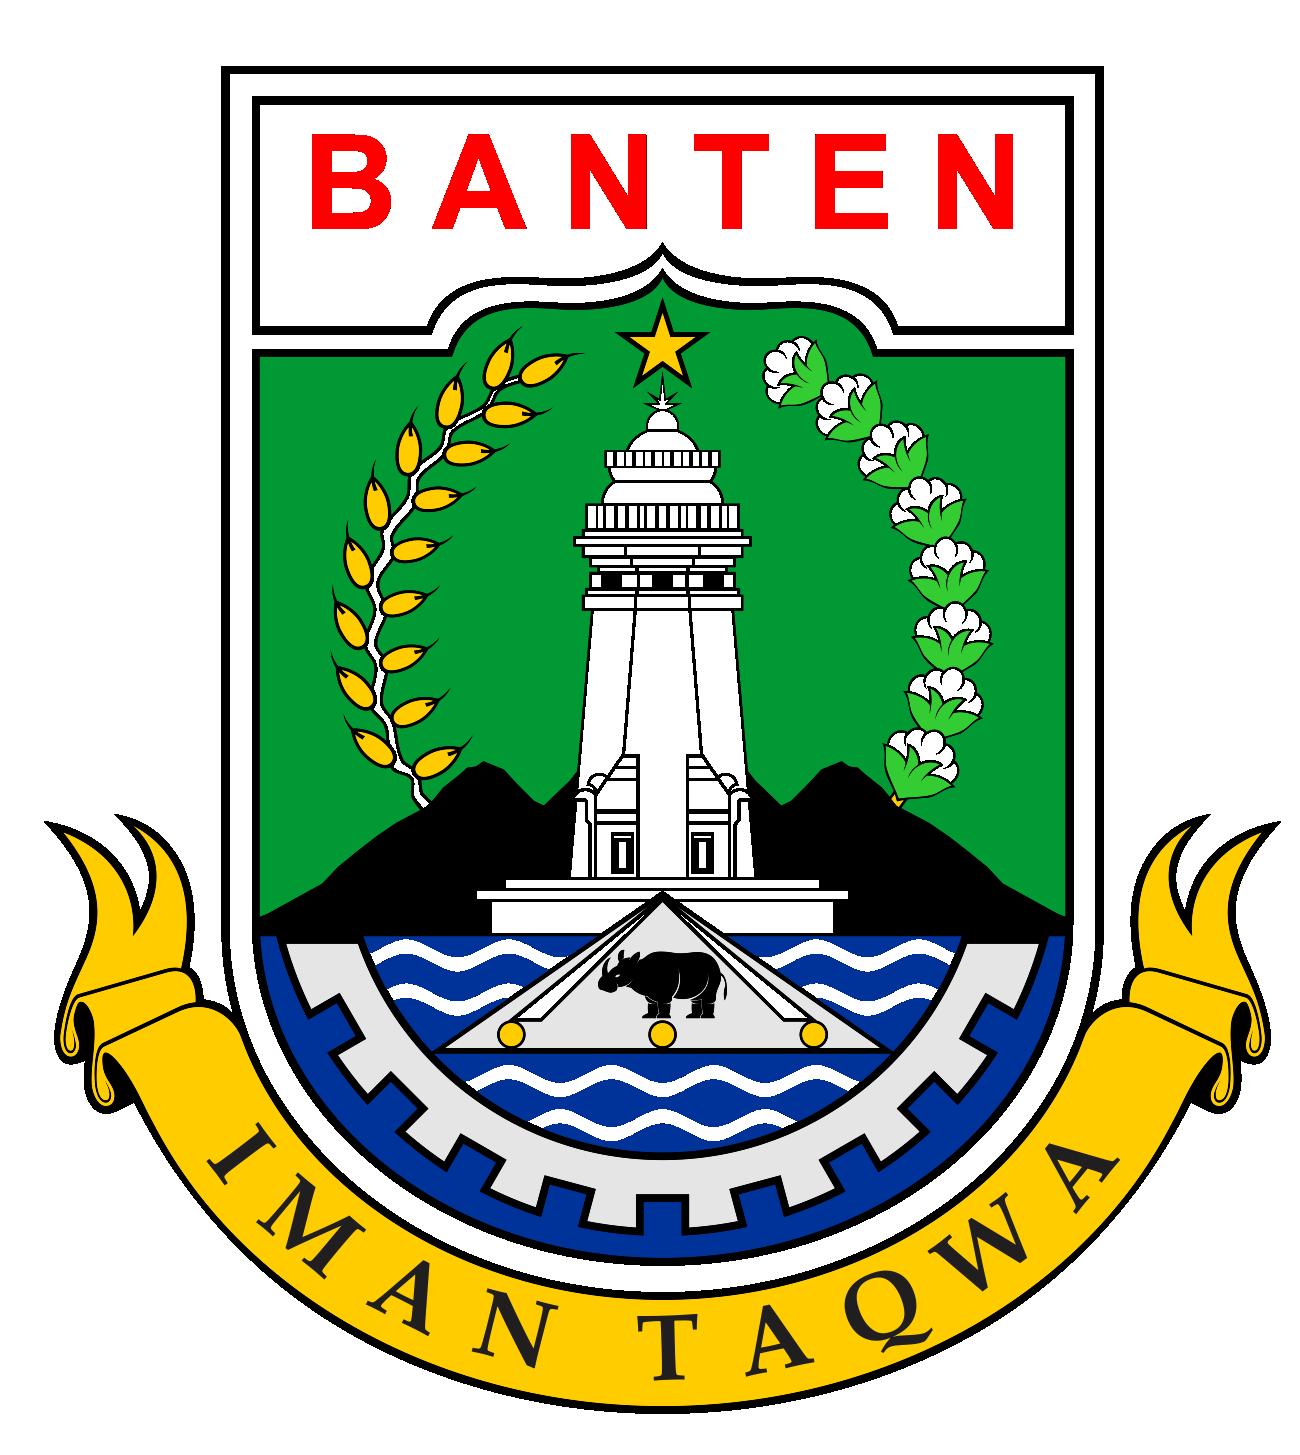 Logo Provinsi Banten Vector Ai Cdr Eps Png Resolusi Gambar Sahabat